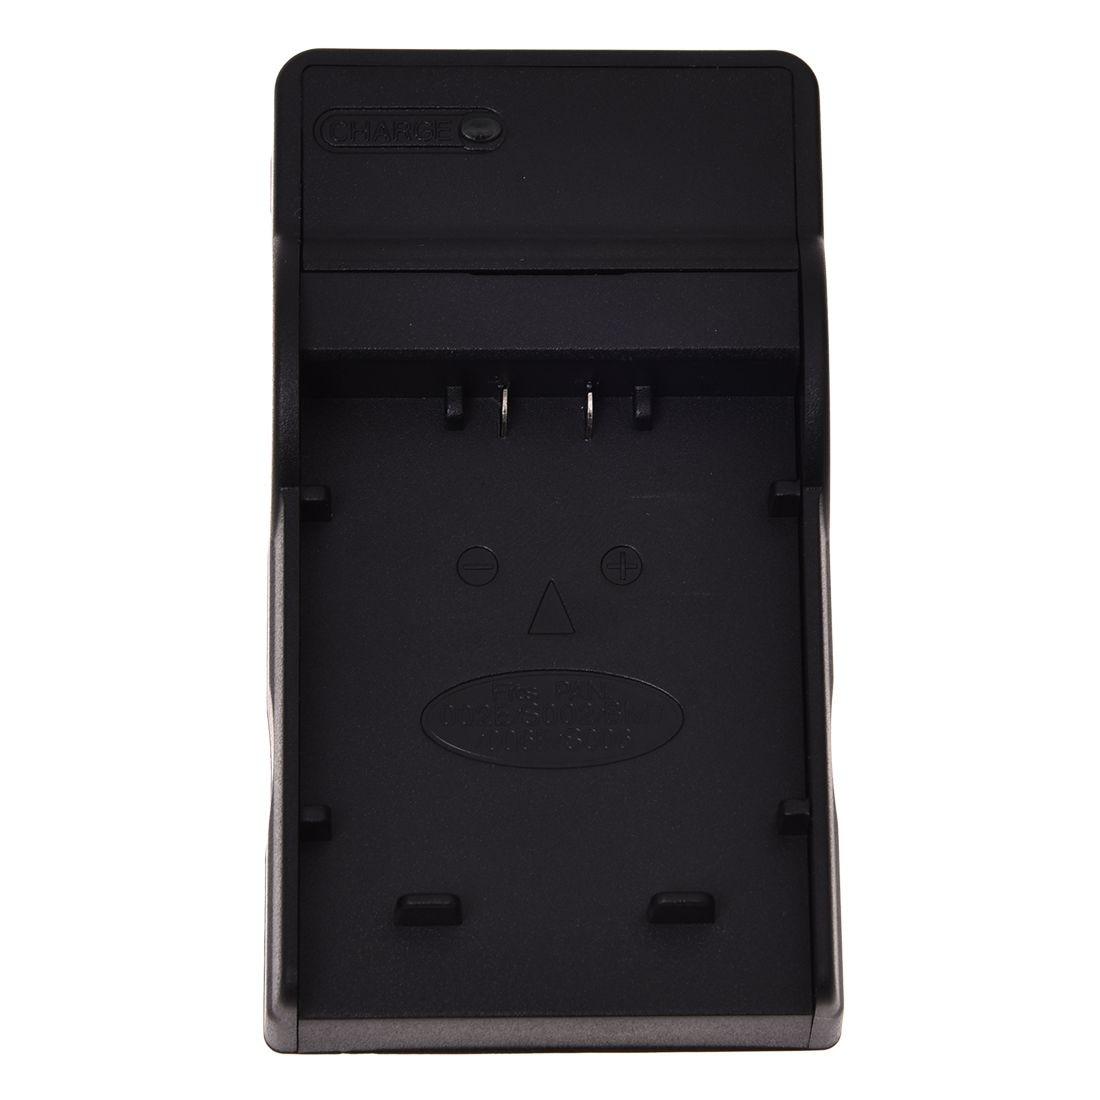 Battery USB <font><b>Charger</b></font> for <font><b>Panasonic</b></font> CGA-S006e <font><b>Lumix</b></font> DMC-FZ8 FZ18 FZ30 FZ35 FZ50 UK